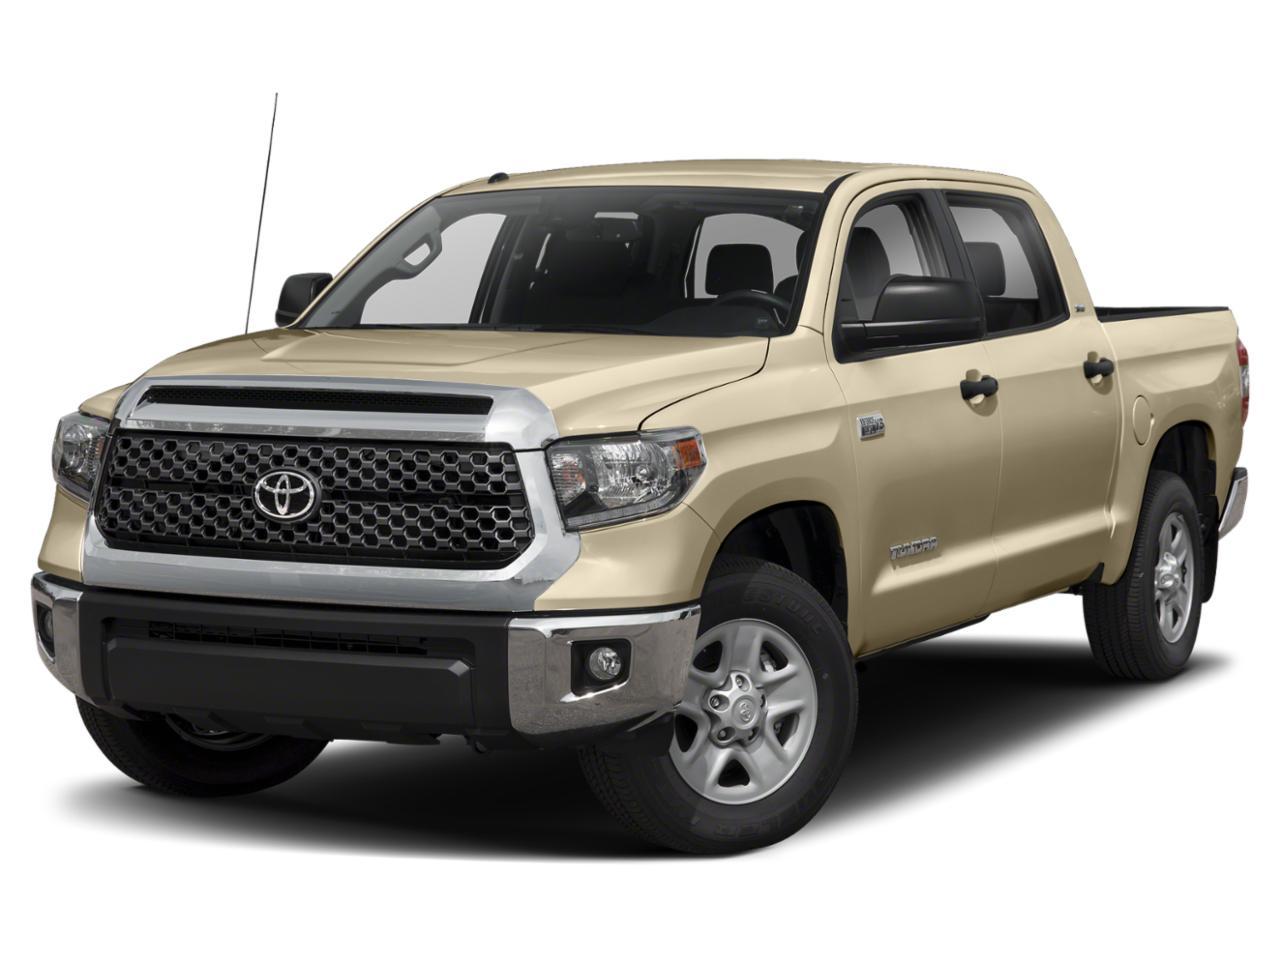 2019 Toyota Tundra 4WD Vehicle Photo in San Antonio, TX 78238